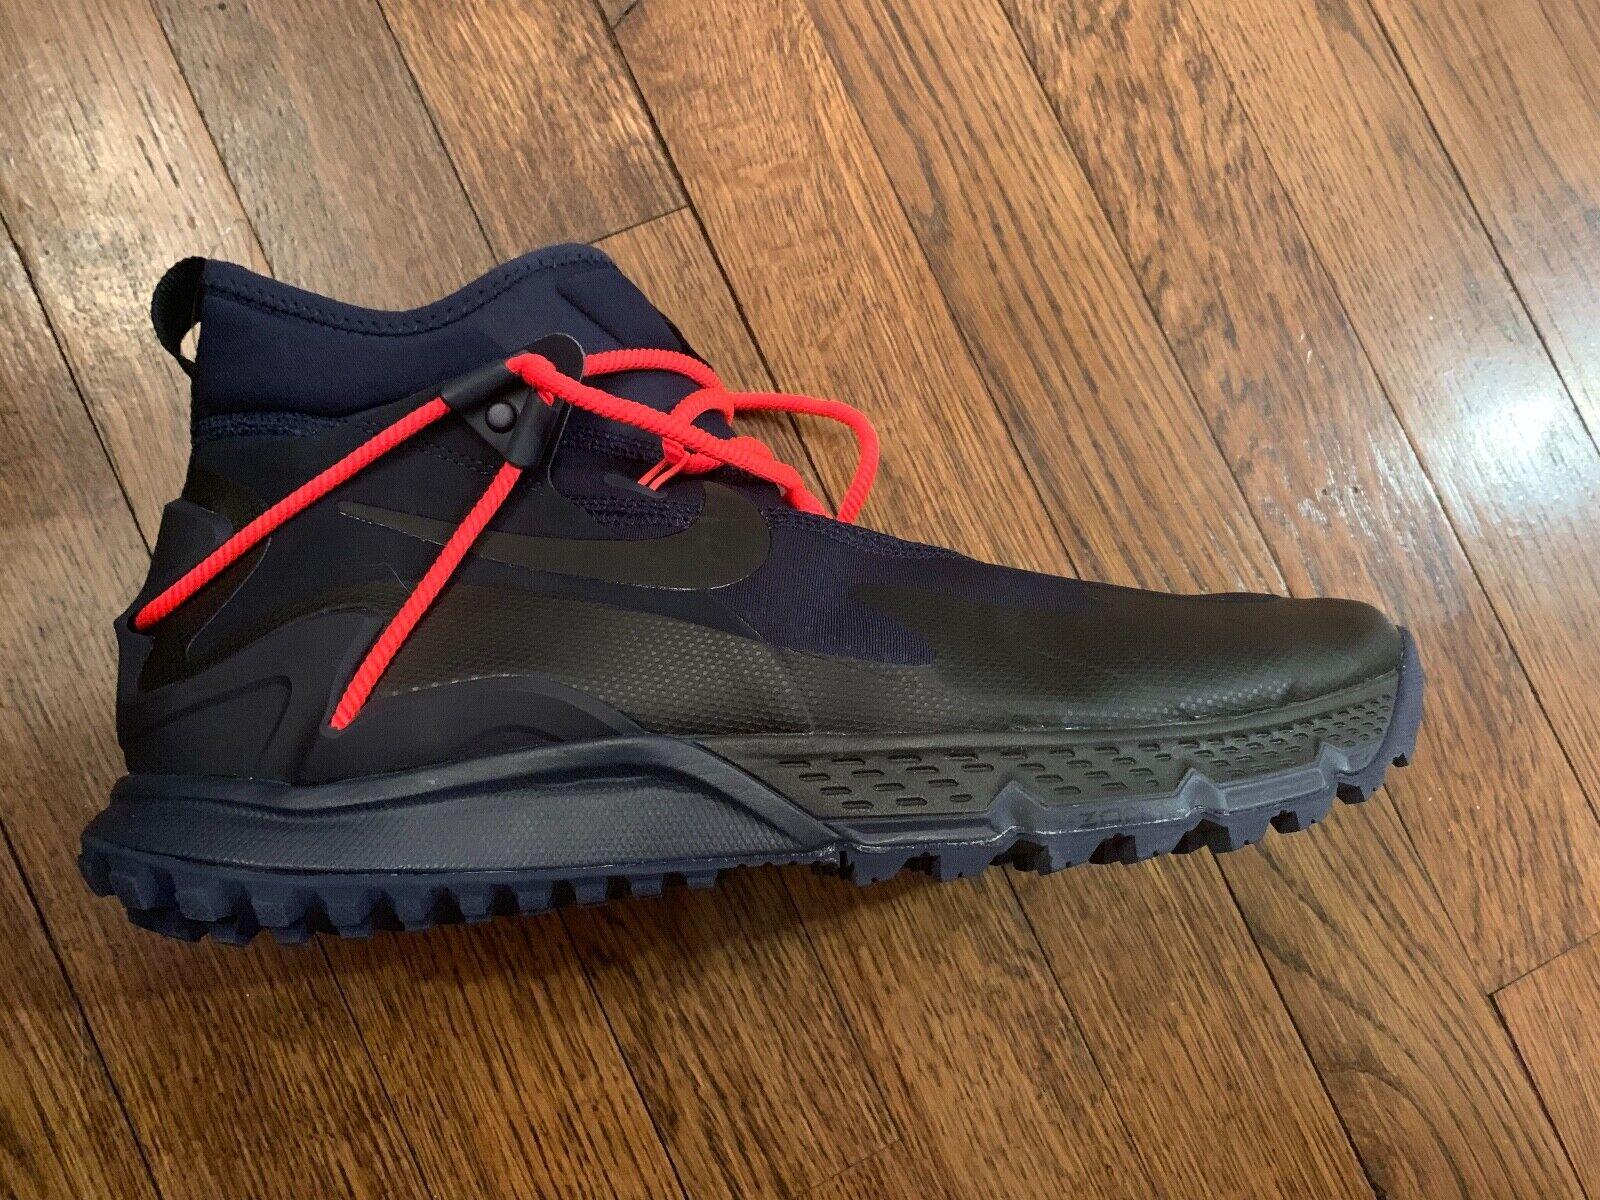 Nike Terra Sertig Boot Mens Size 11 Hiking Trail Dark Obsidian Black 916830-400